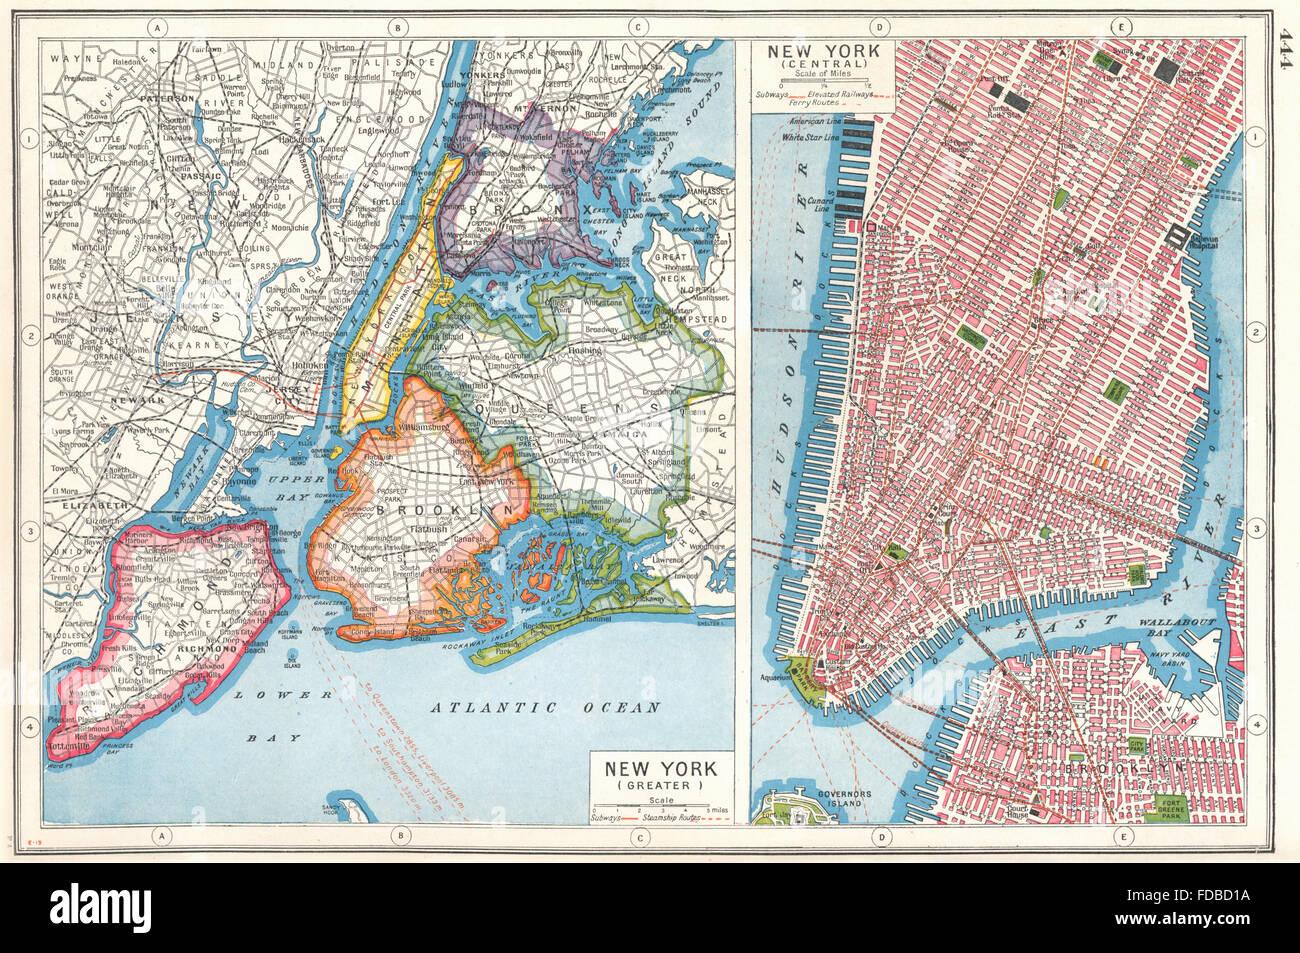 Map Of New York Showing Queens.New York City Nyc Lower Manhattan Queens Bronx Brooklyn Richmond